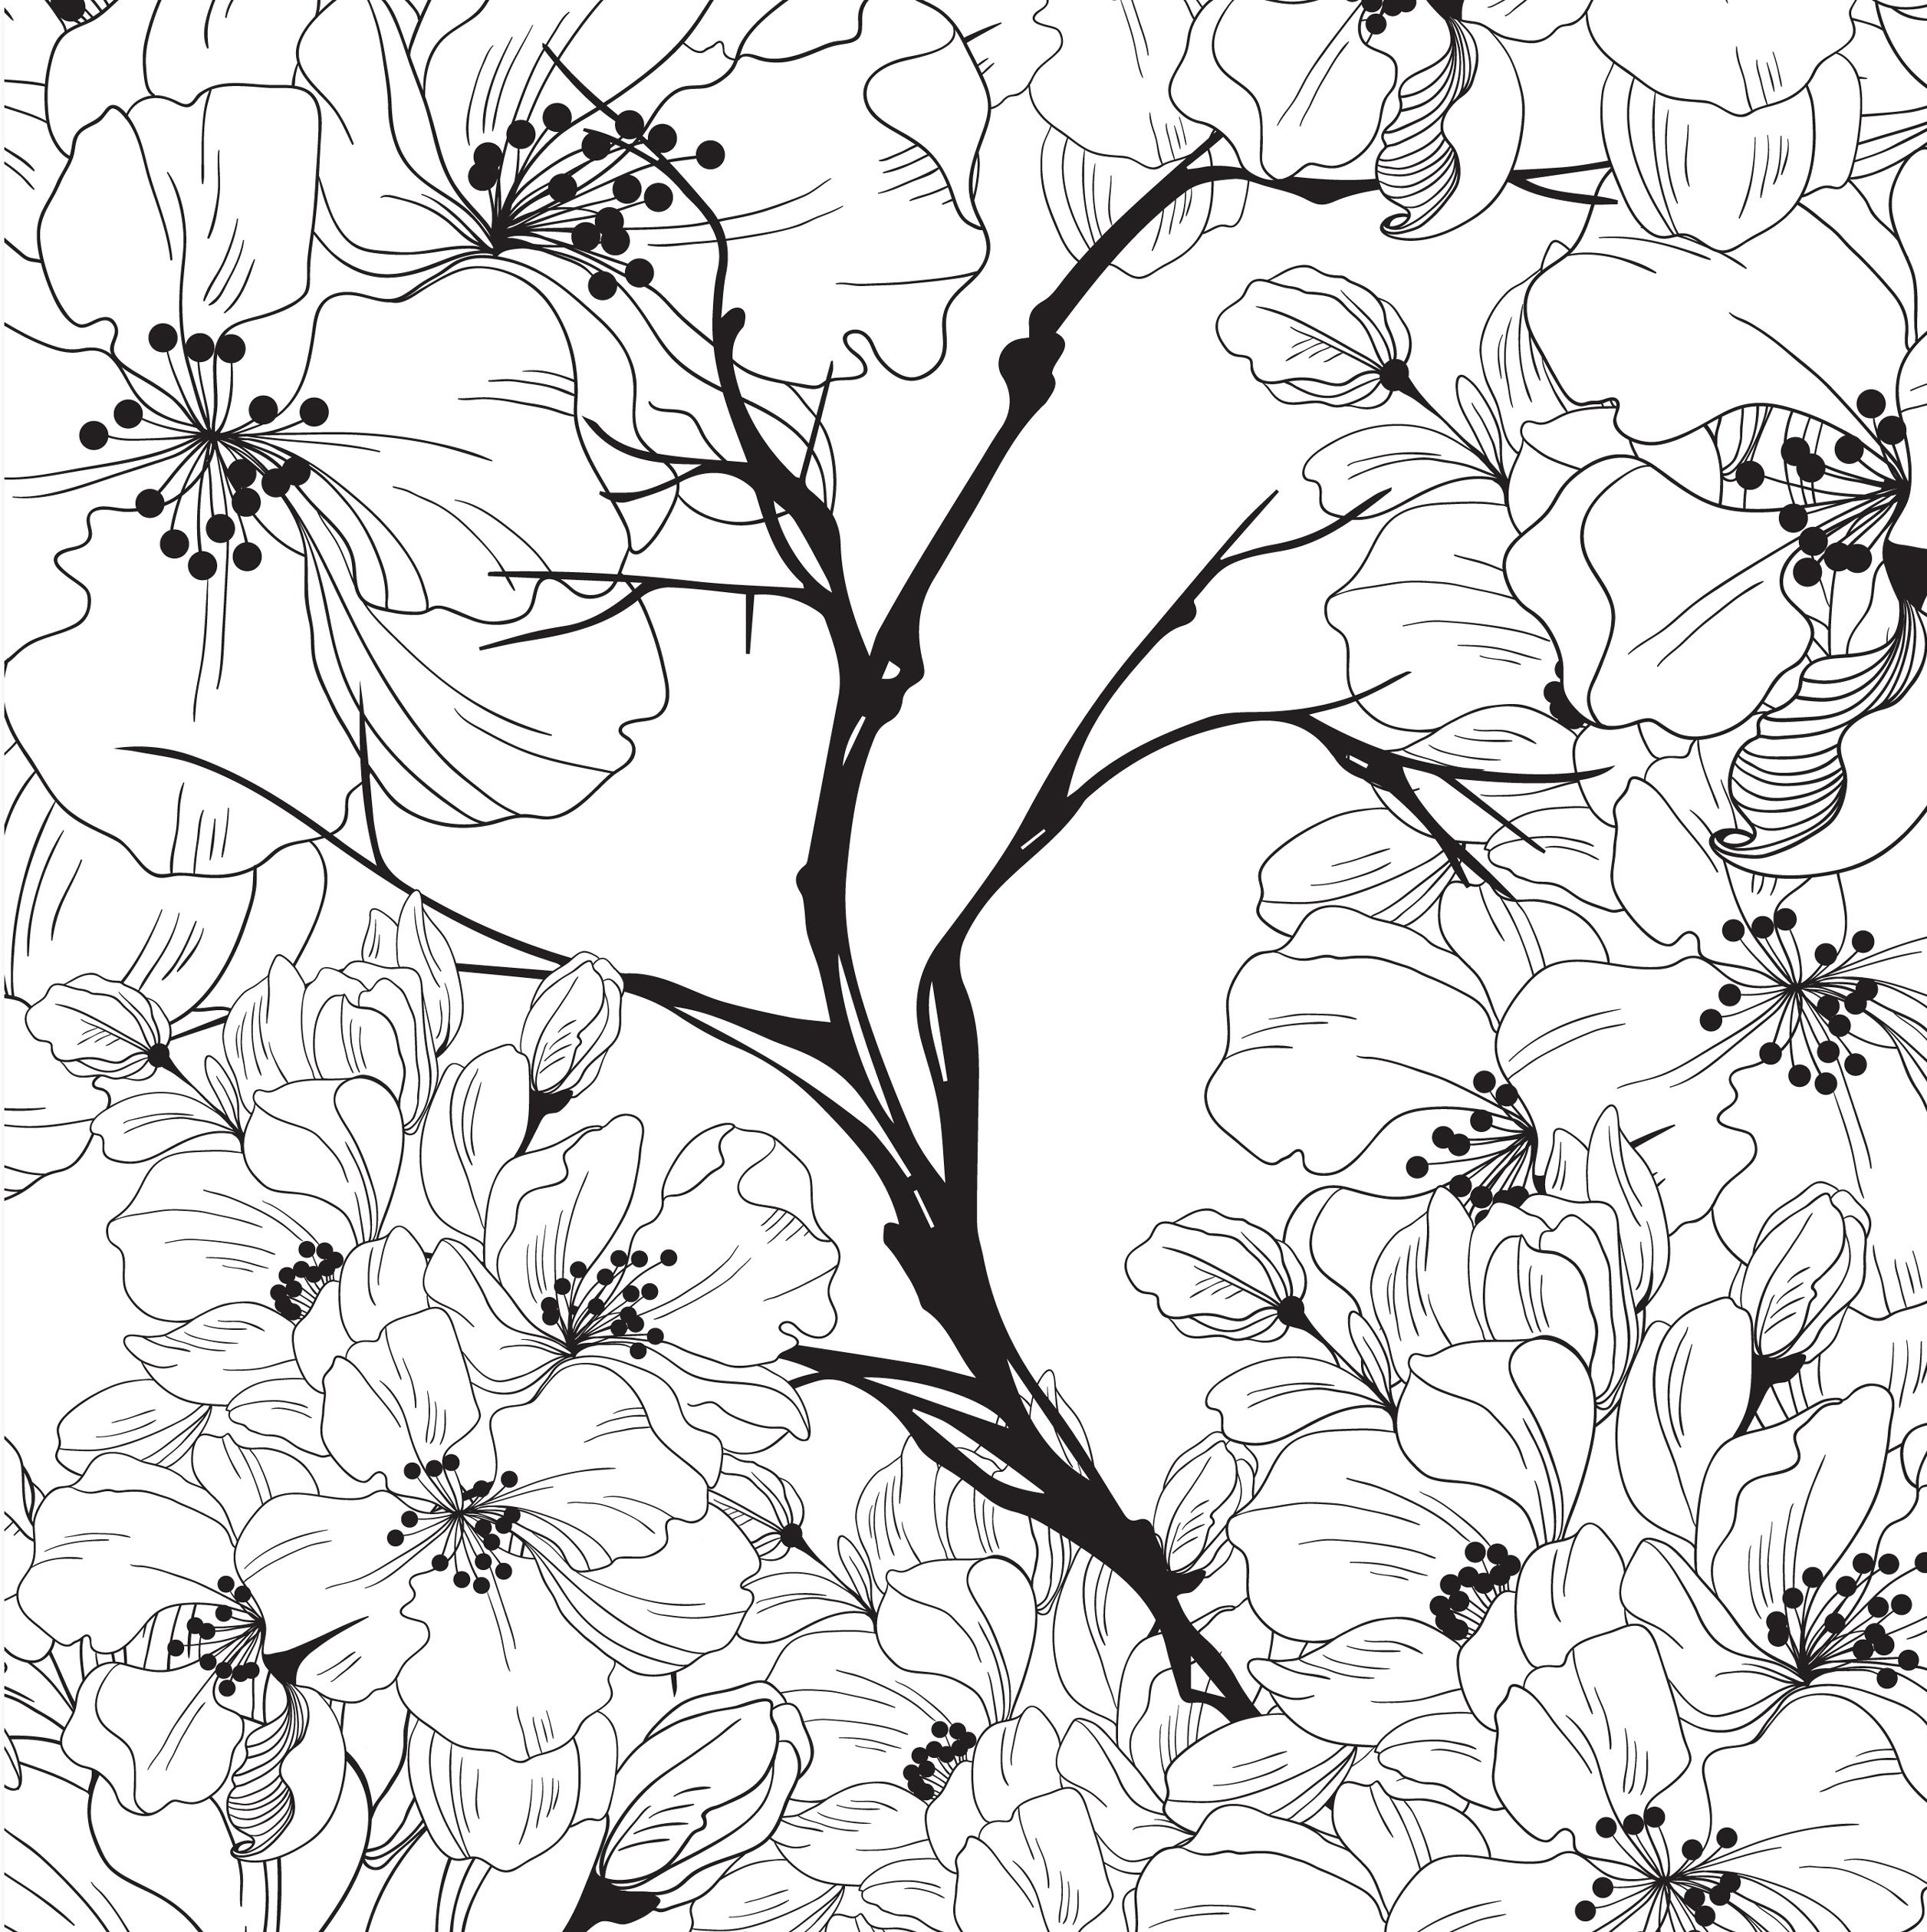 Сакура - Цветы - Раскраски антистресс